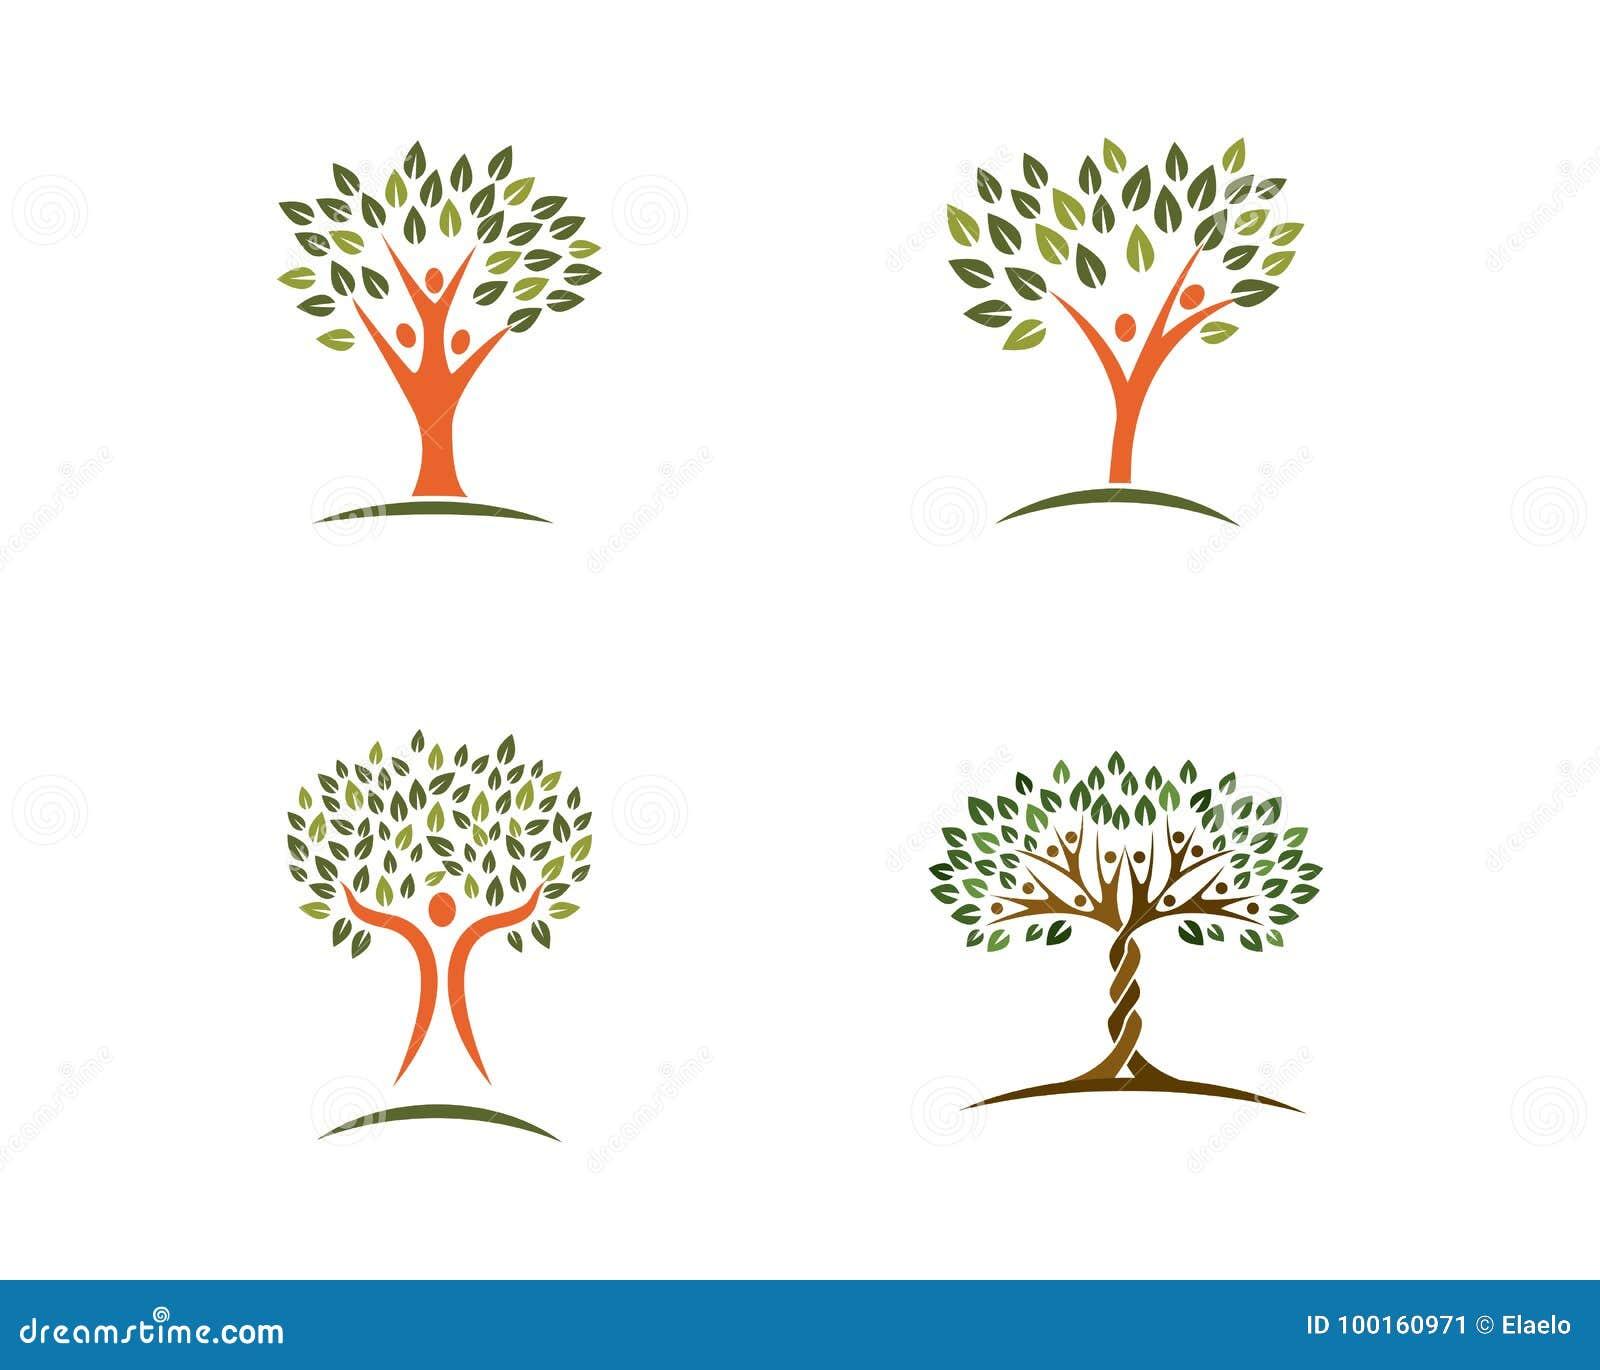 friendship tree template - friendship tree template choice image professional